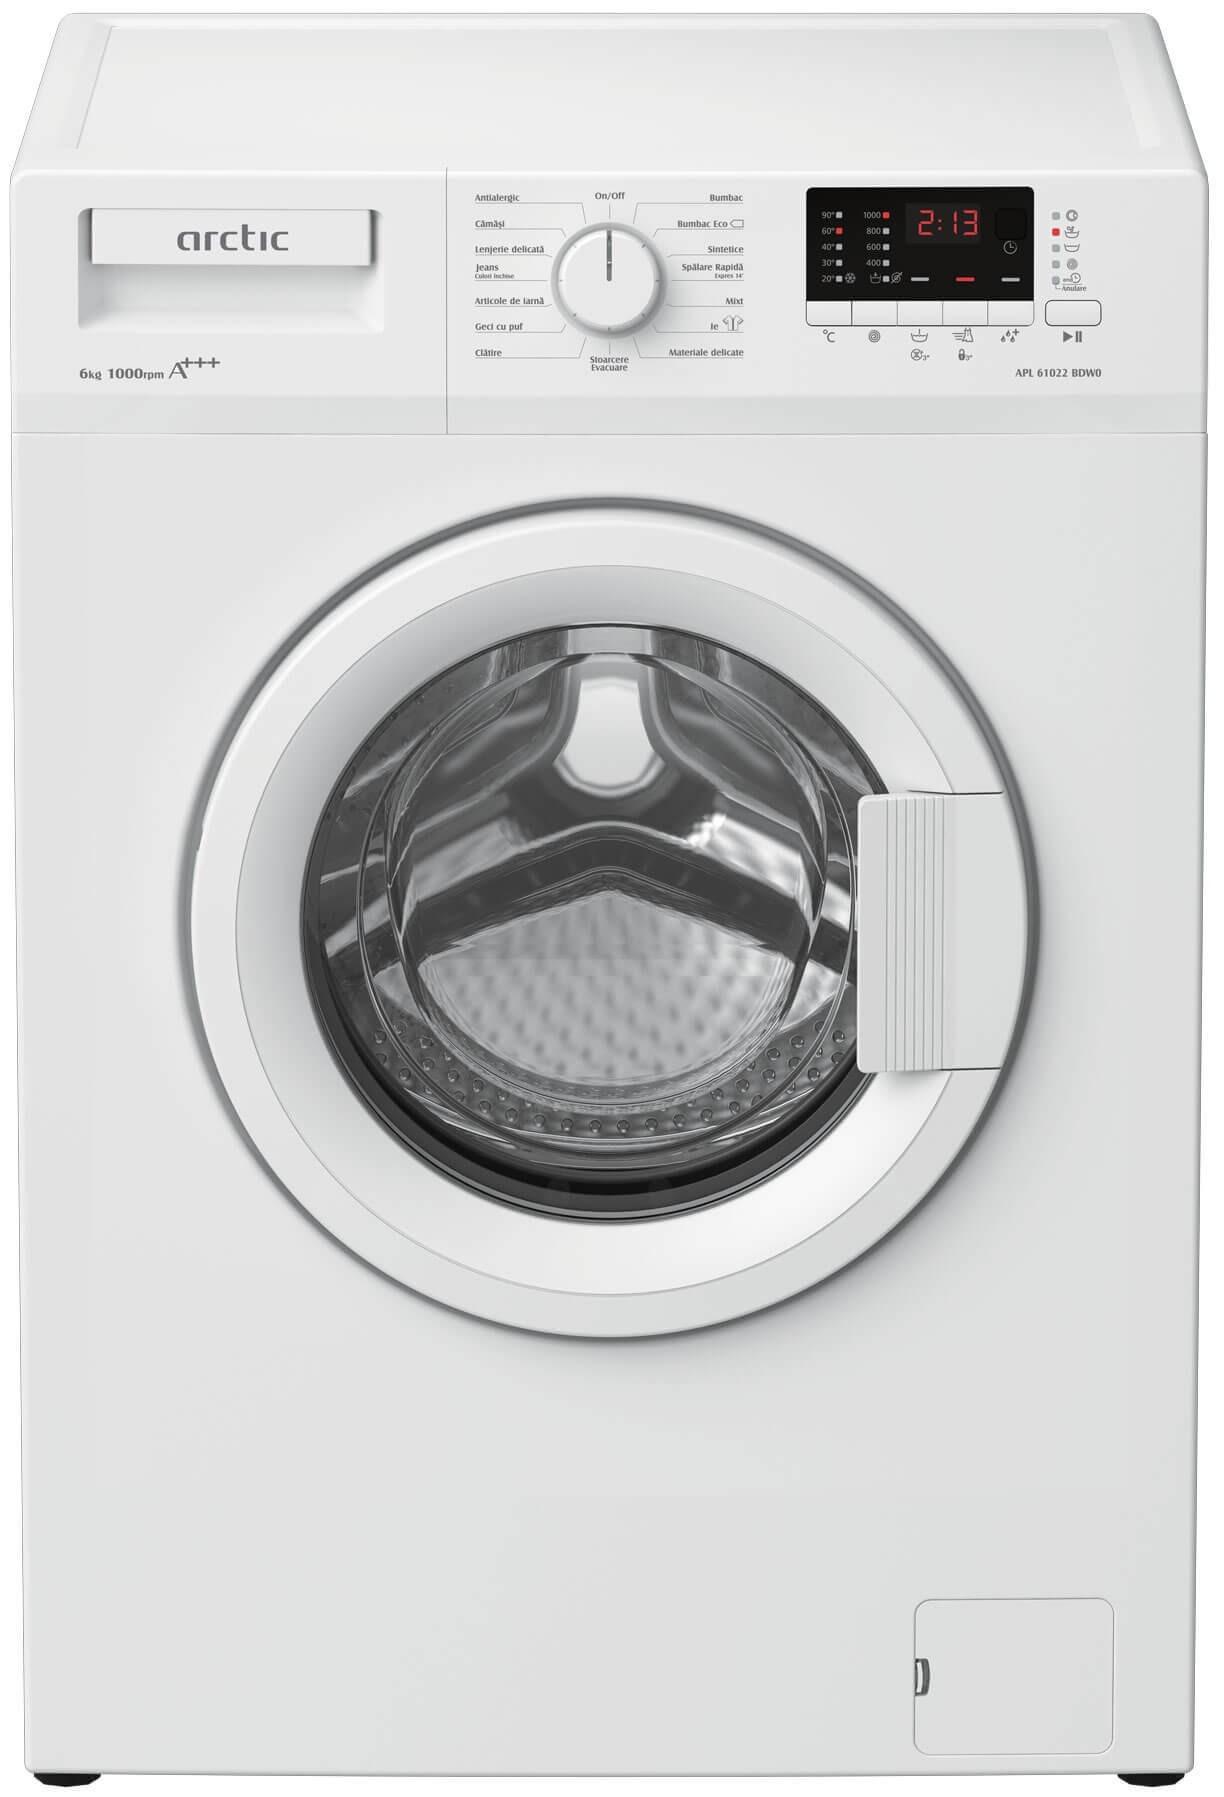 Masina de spalat rufe APL61022BDW0